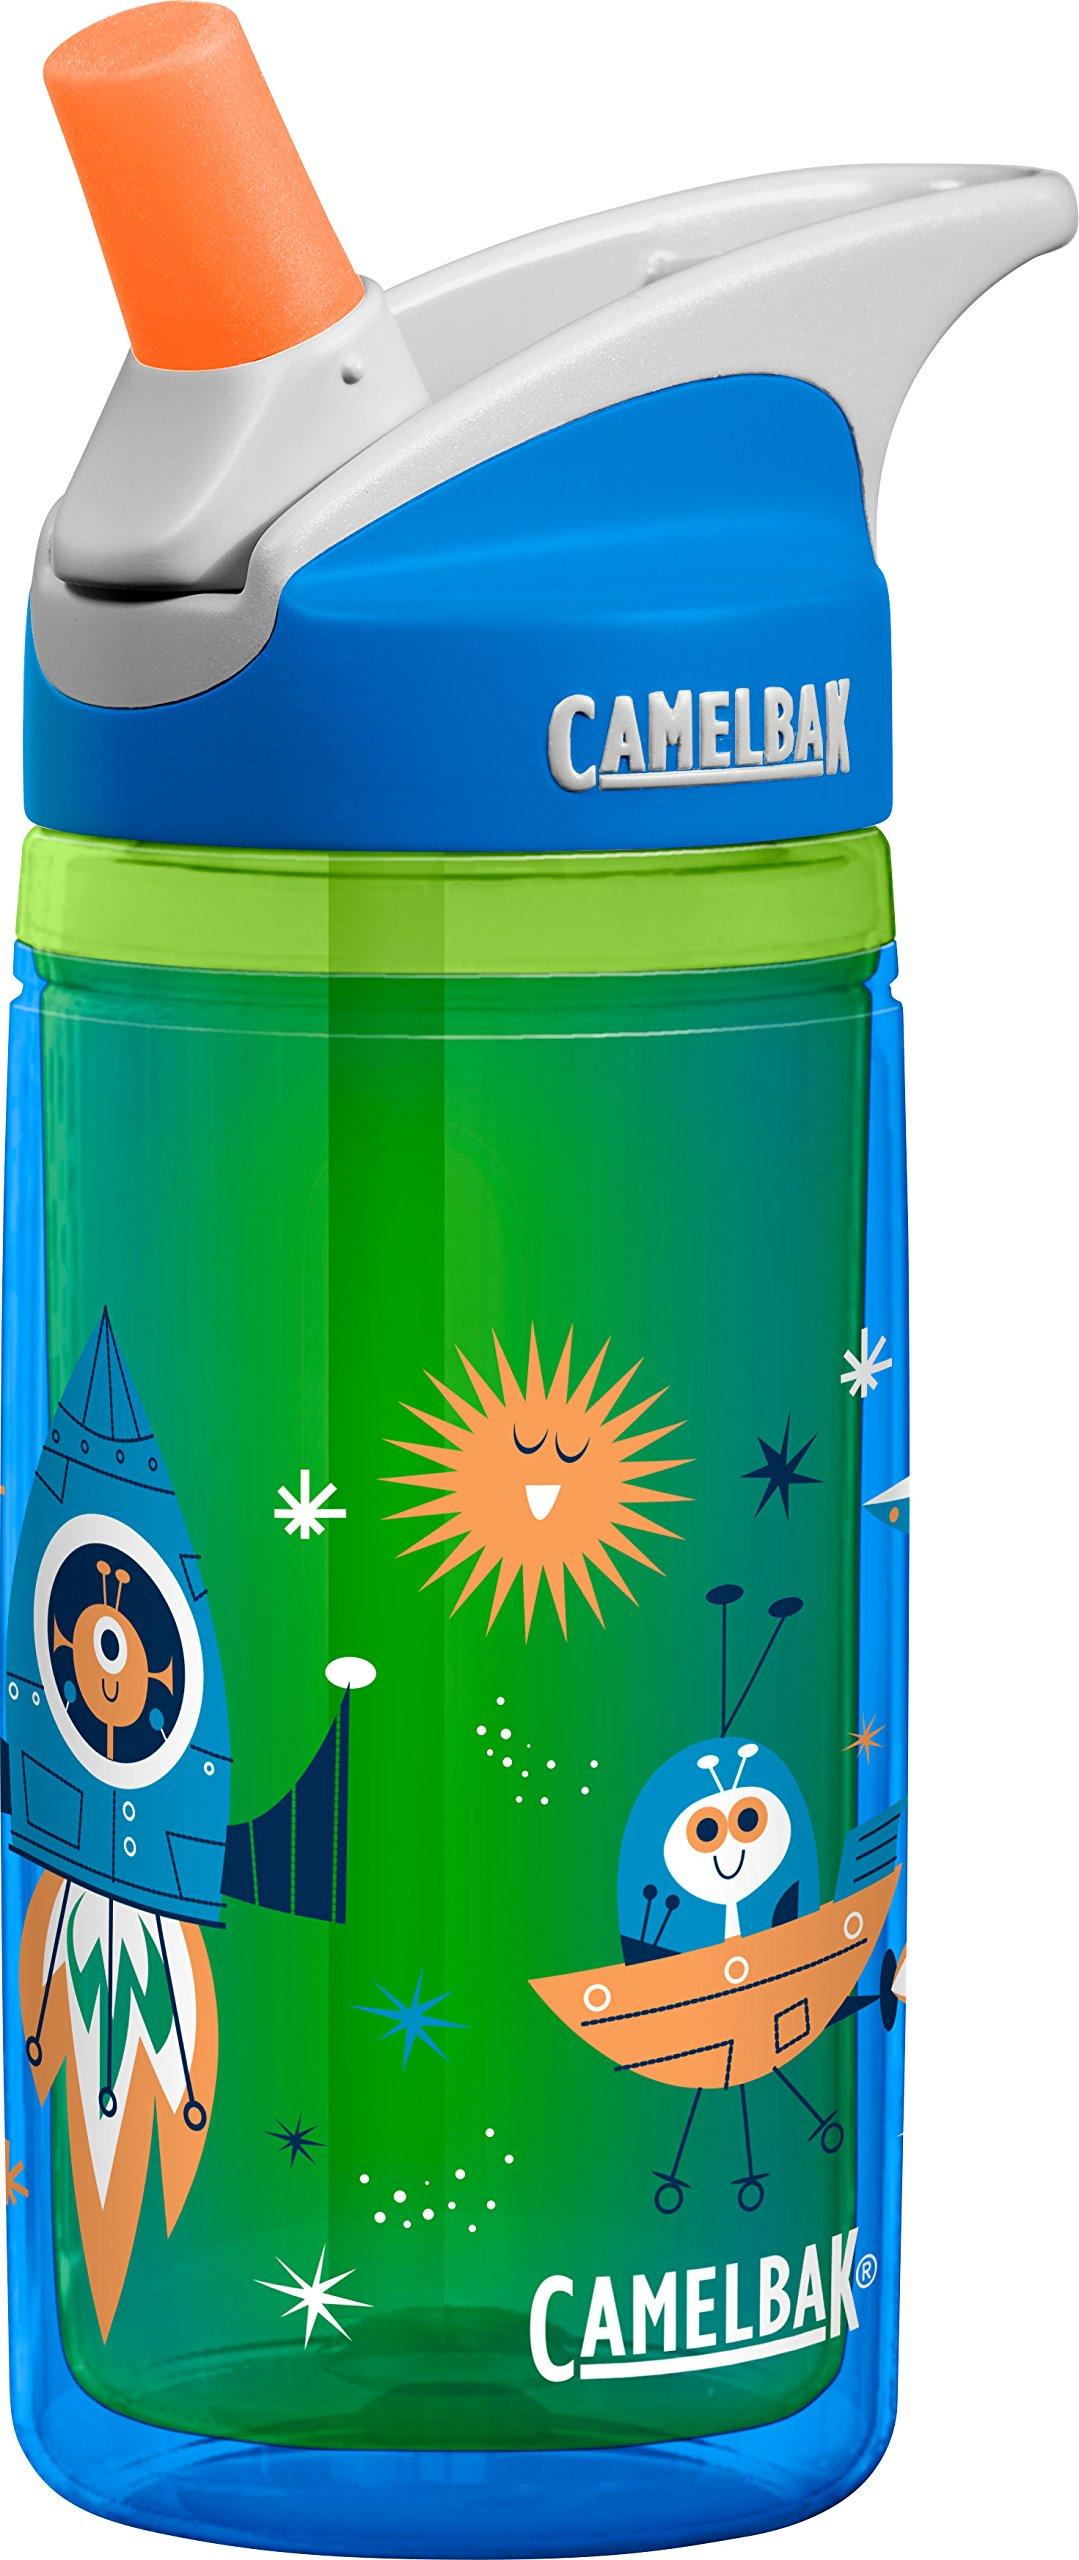 CamelBak eddy Kids Insulated Bottle, Blue Rockets, 12oz